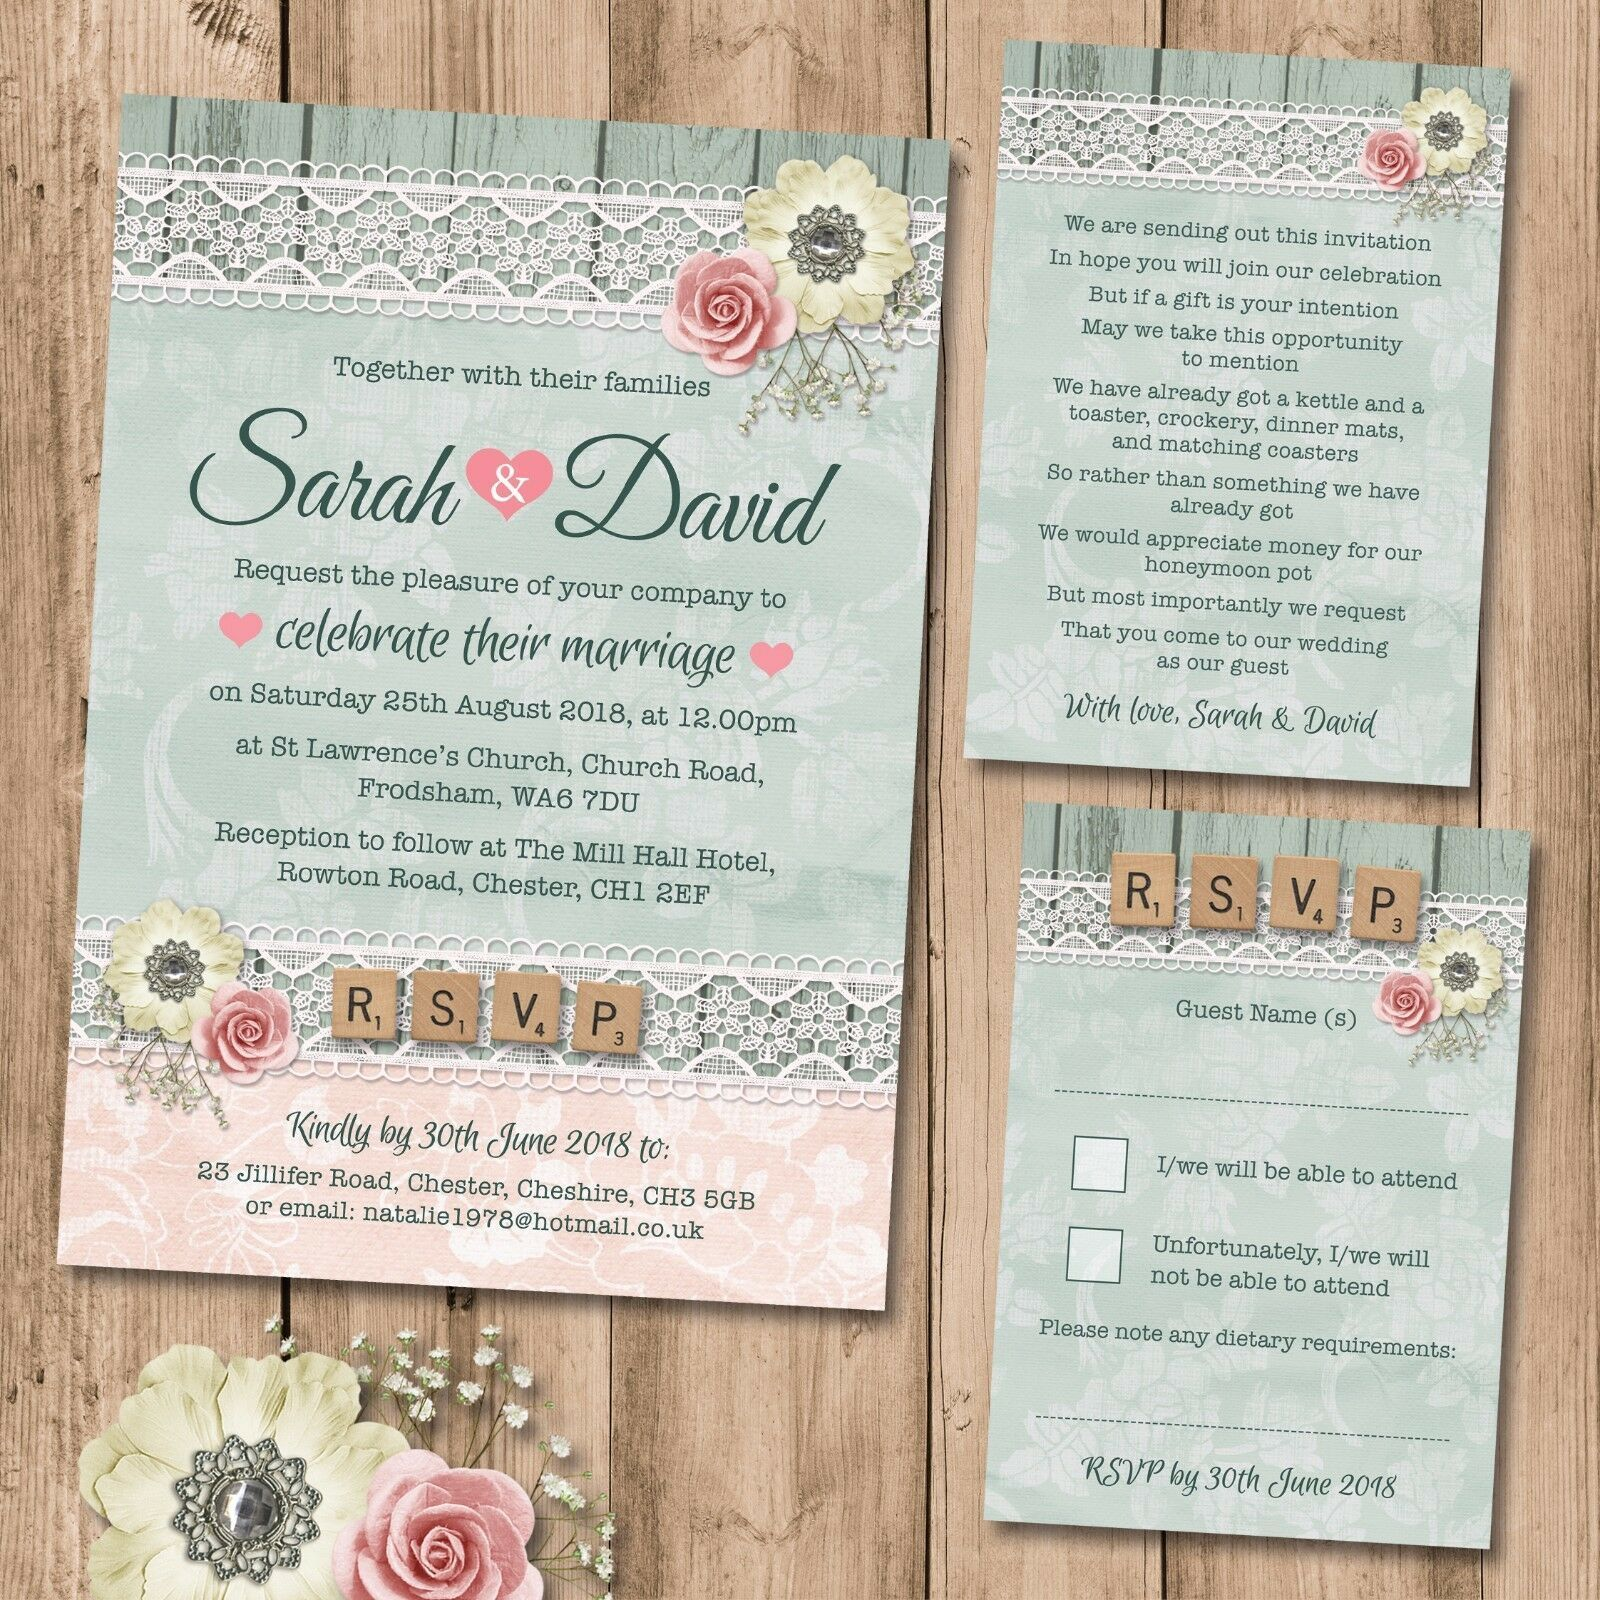 Details About Package Deal Wedding Invitation Rsvp And Gift Poem Rustic Rose La In 2020 Wedding Invitation Packages Evening Wedding Invitations Wedding Invitation Sets